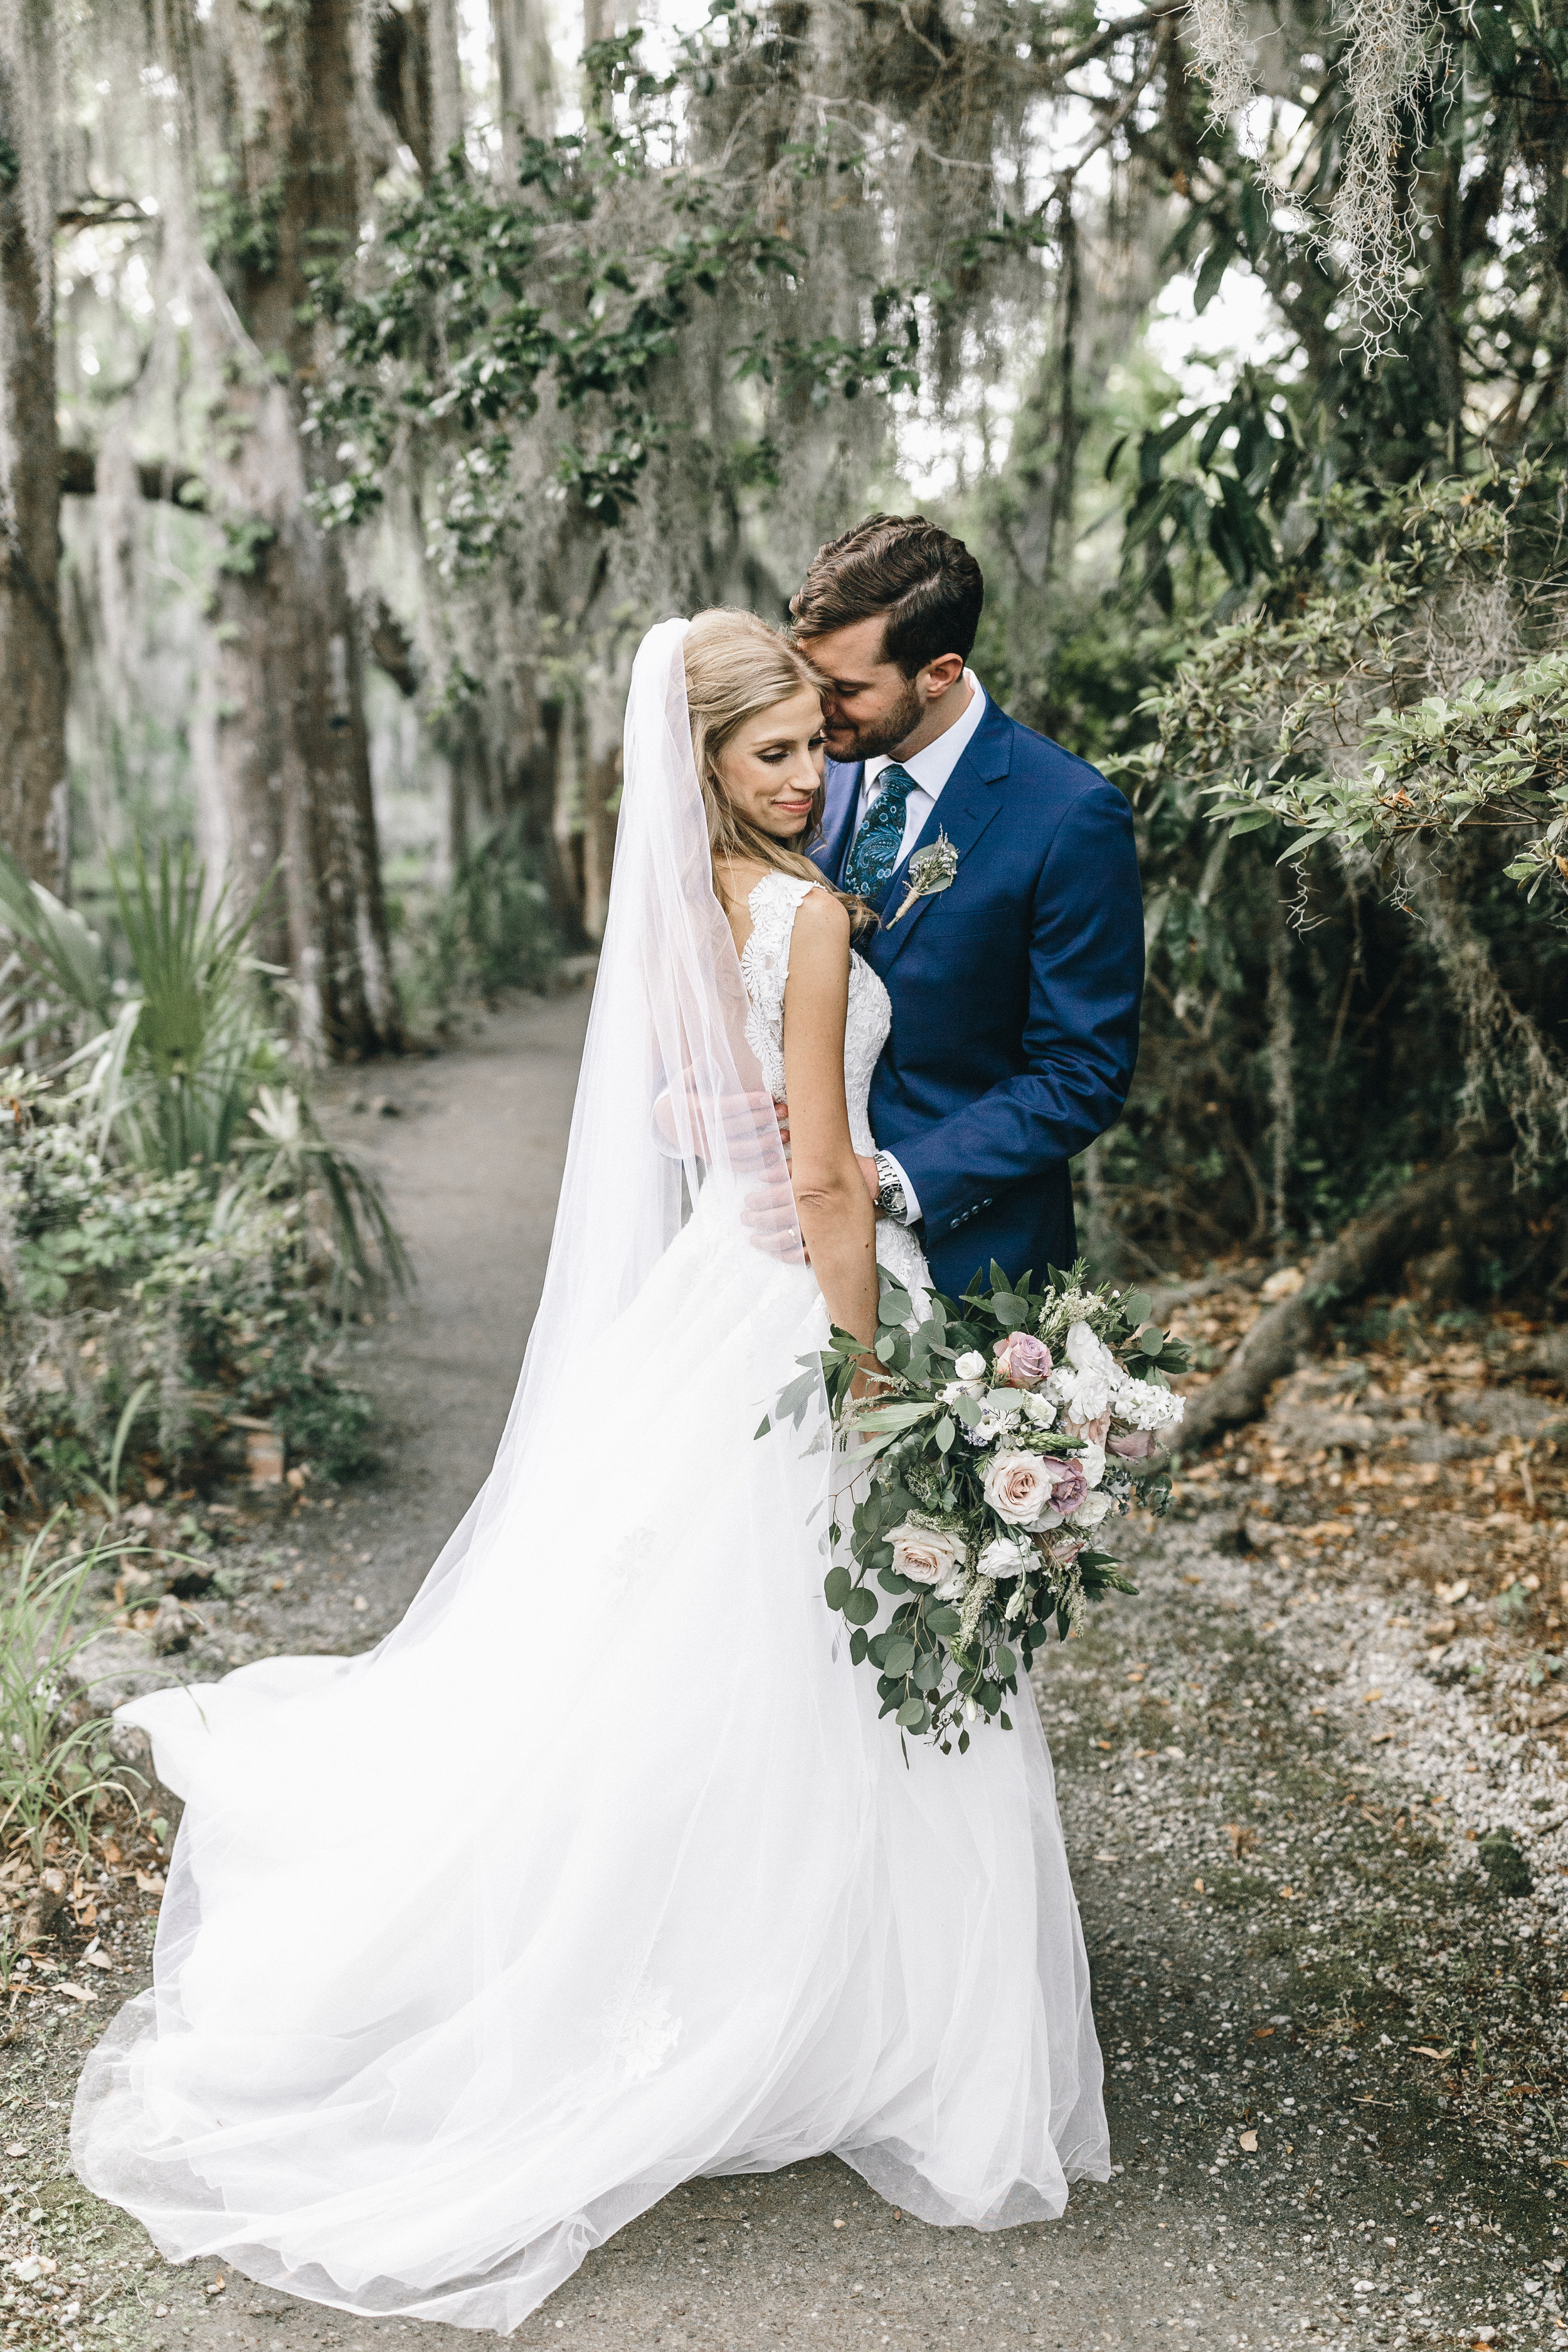 Jenna+Michael_wedding-601.jpg